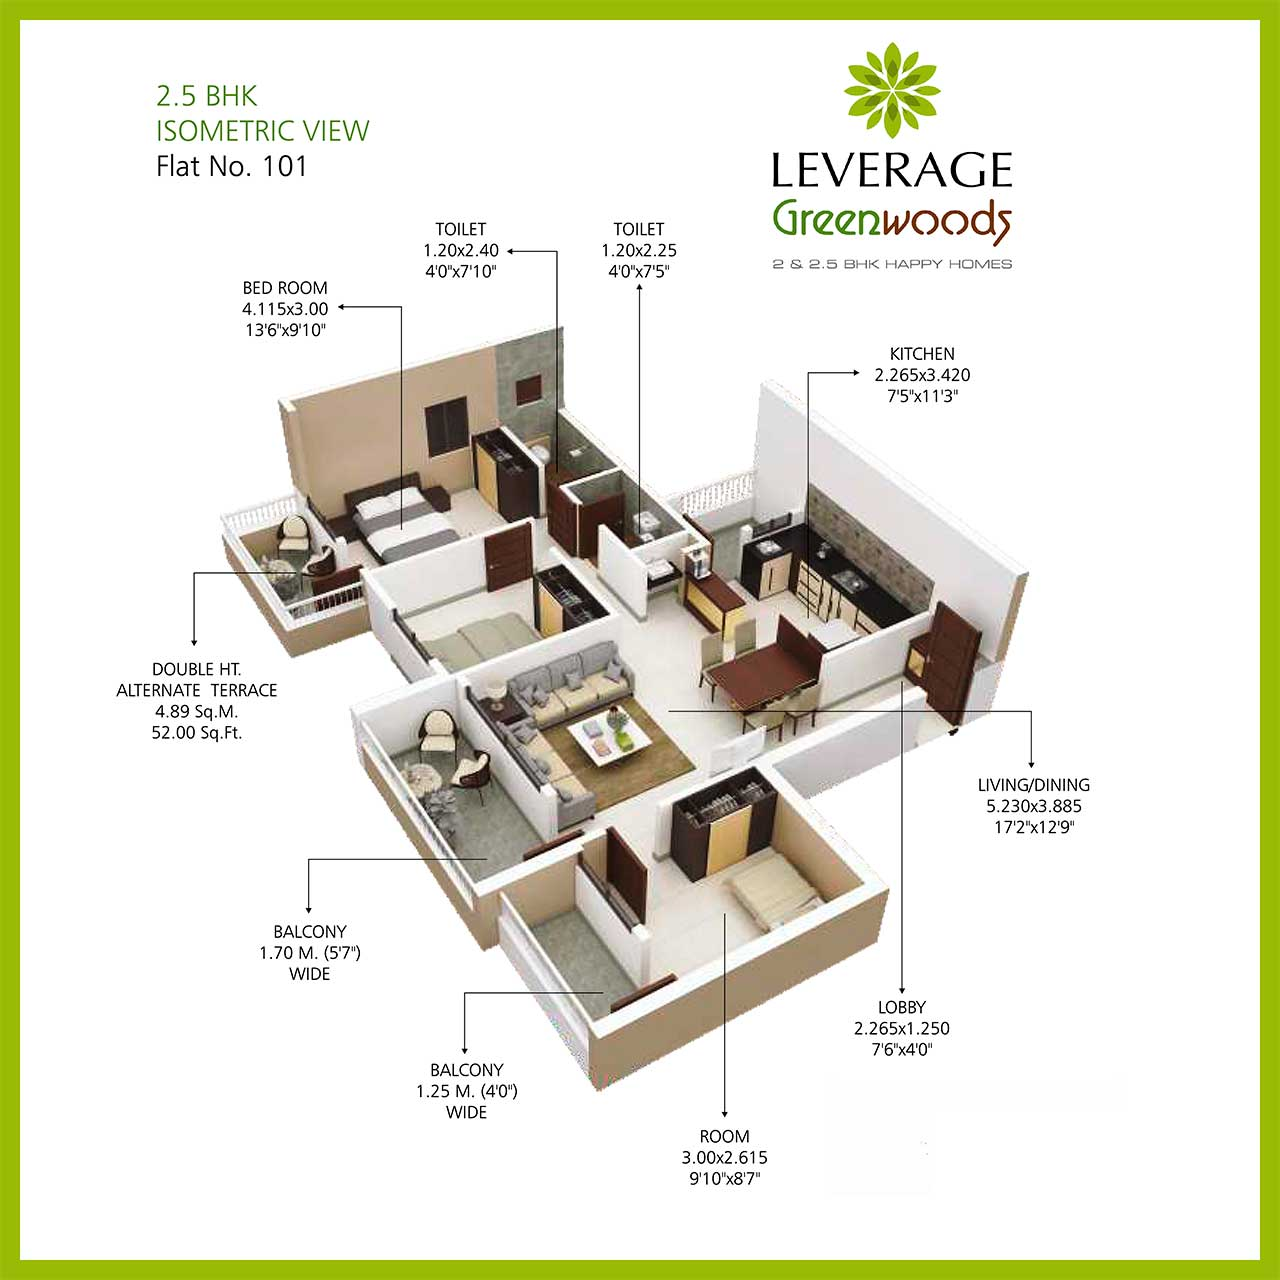 leverage-greenwood-harmony-25bhk-isometric